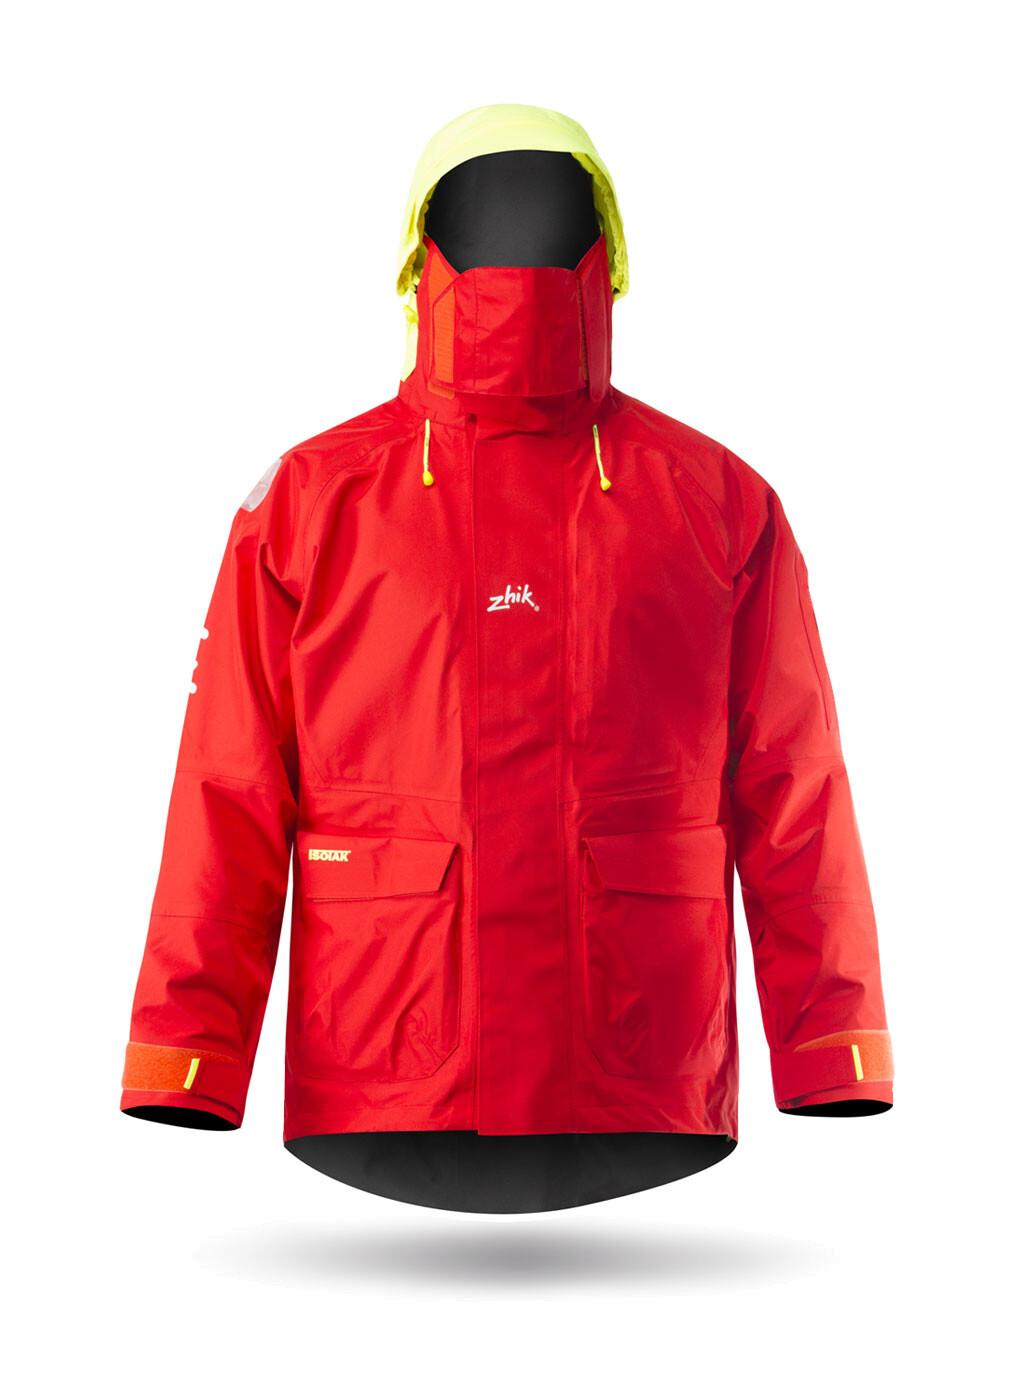 Zhik Jacket Offshore OFS800 Isotak 2 Red L